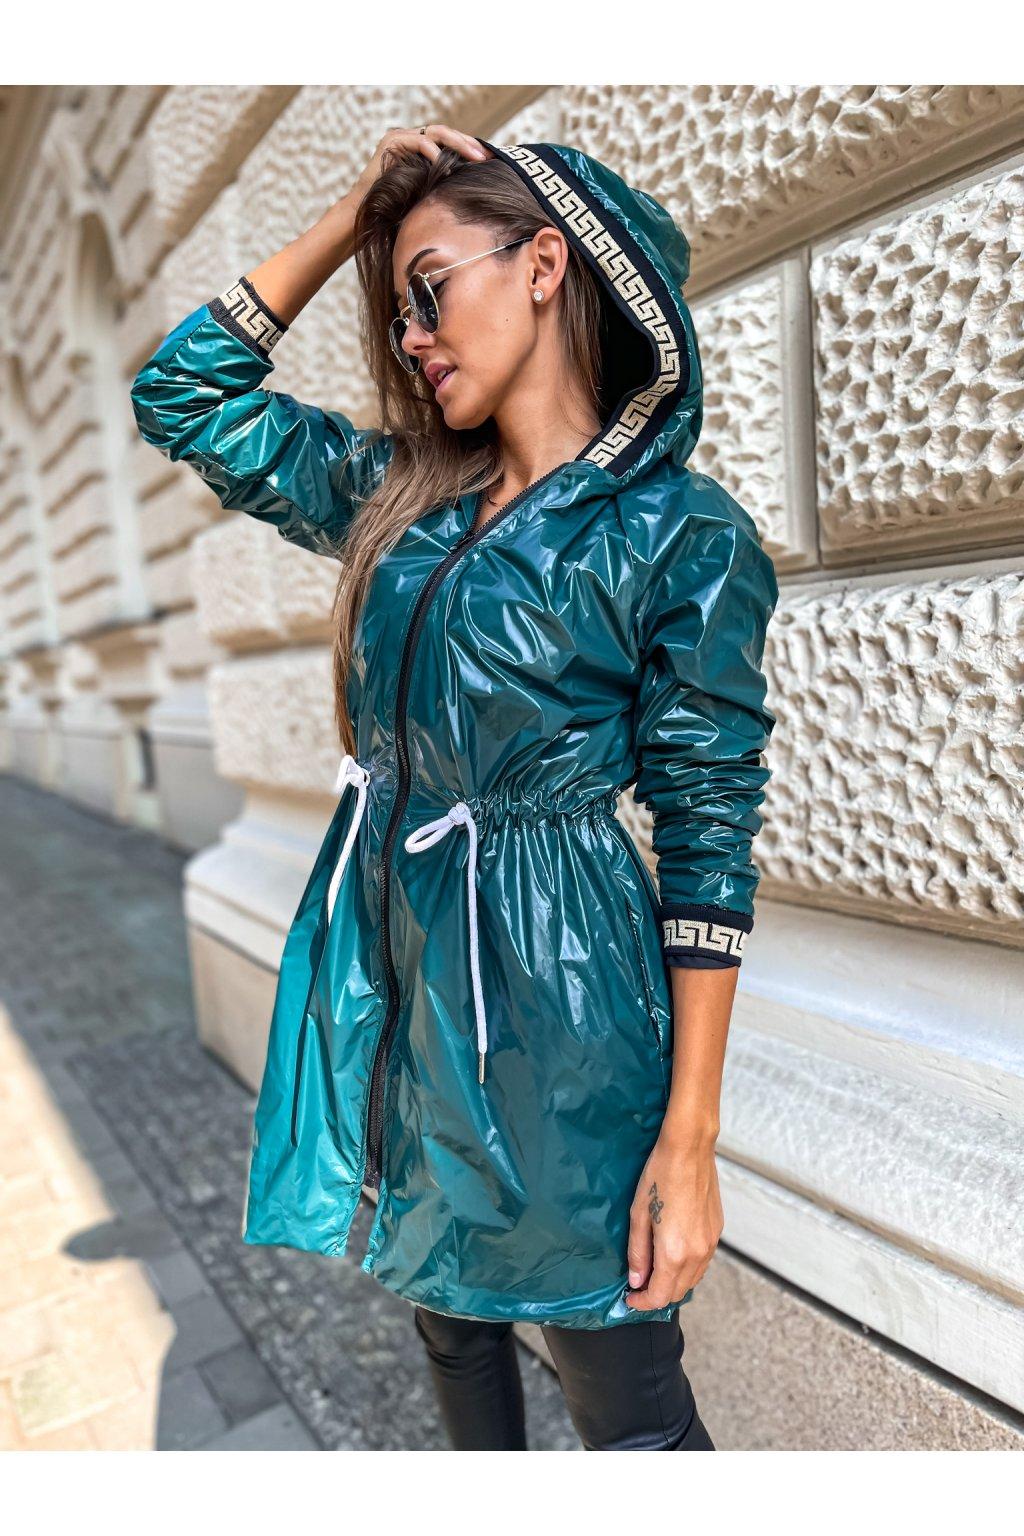 damska prodlouzena bunda verra smaragd eshopat cz 1